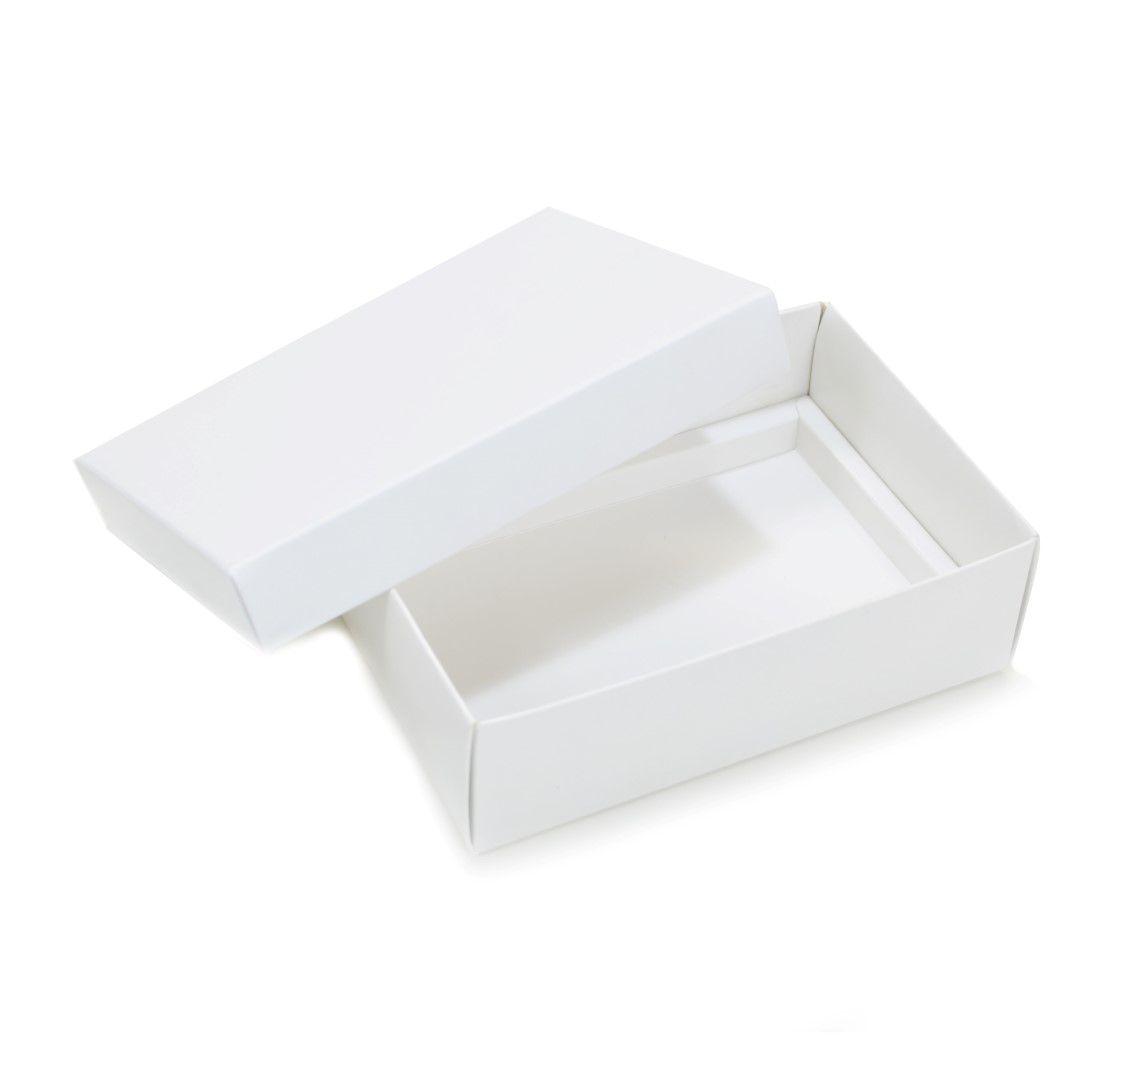 Ref 019 Branca - Caixa p/ 6 Brigadeiro Gourmet Pelotines - c/ tampa papel - 13x9x4 cm - c/ 10 unidades